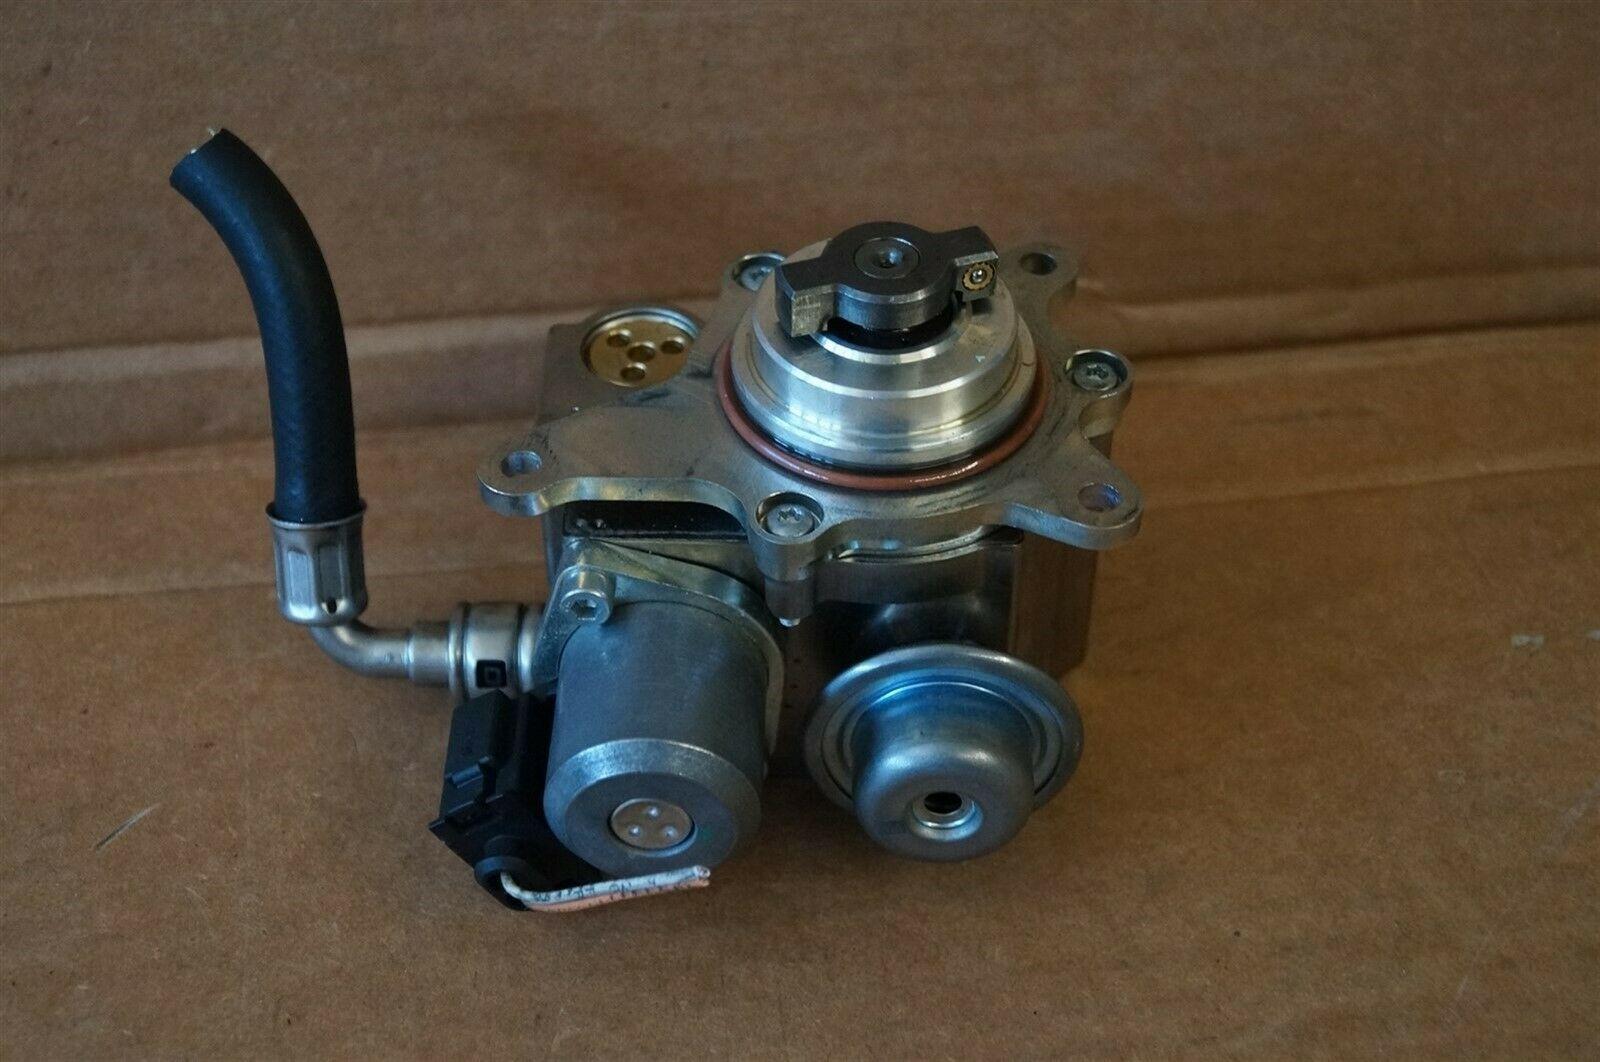 BMW MINI Cooper S Turbo R55 R56 R57 R58 R59 High Pressure Fuel Pump HPFP - N14